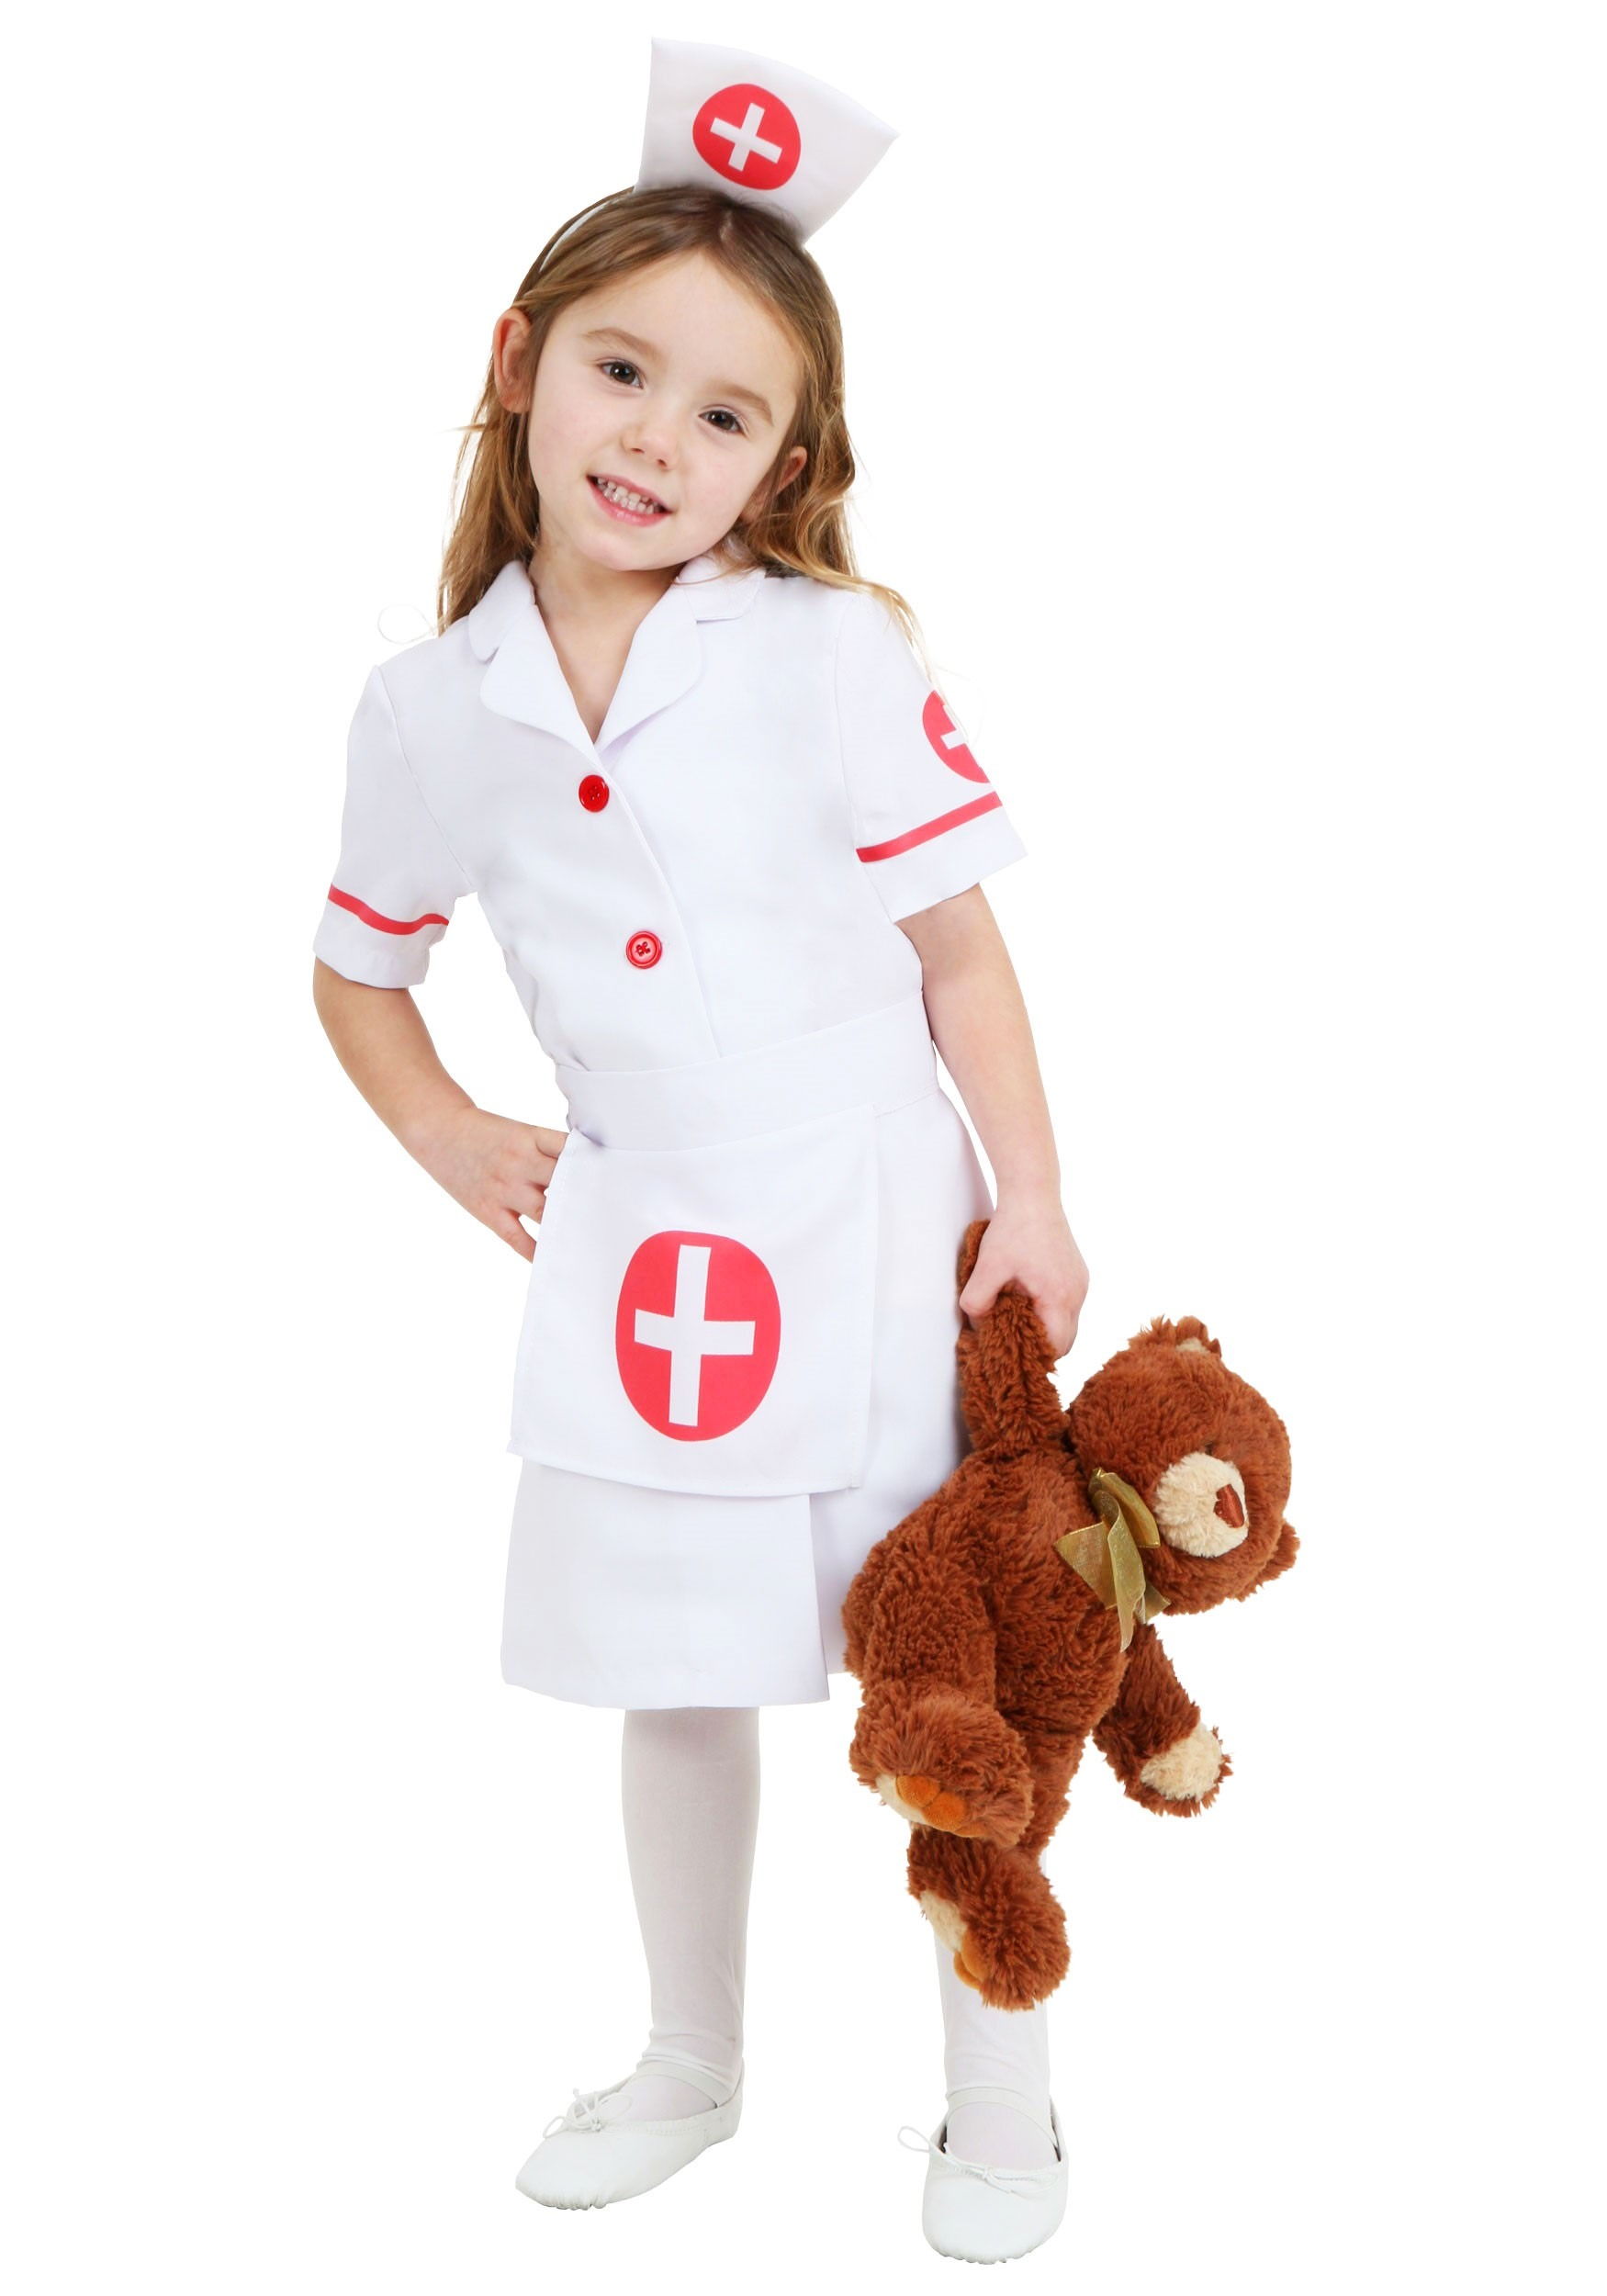 Toddler Nurse Costume